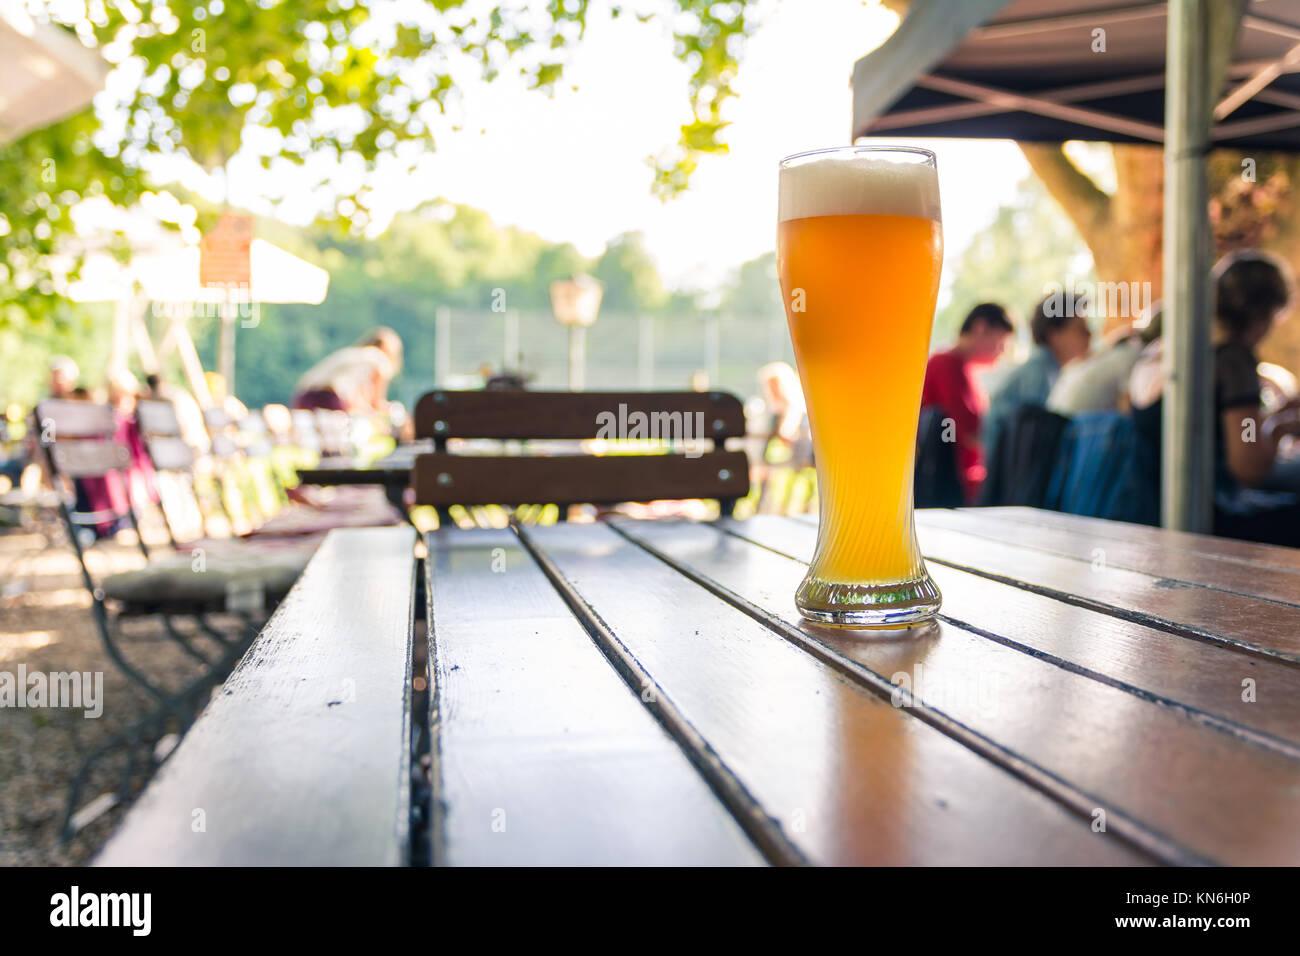 German Brewery Stock Photos Amp German Brewery Stock Images